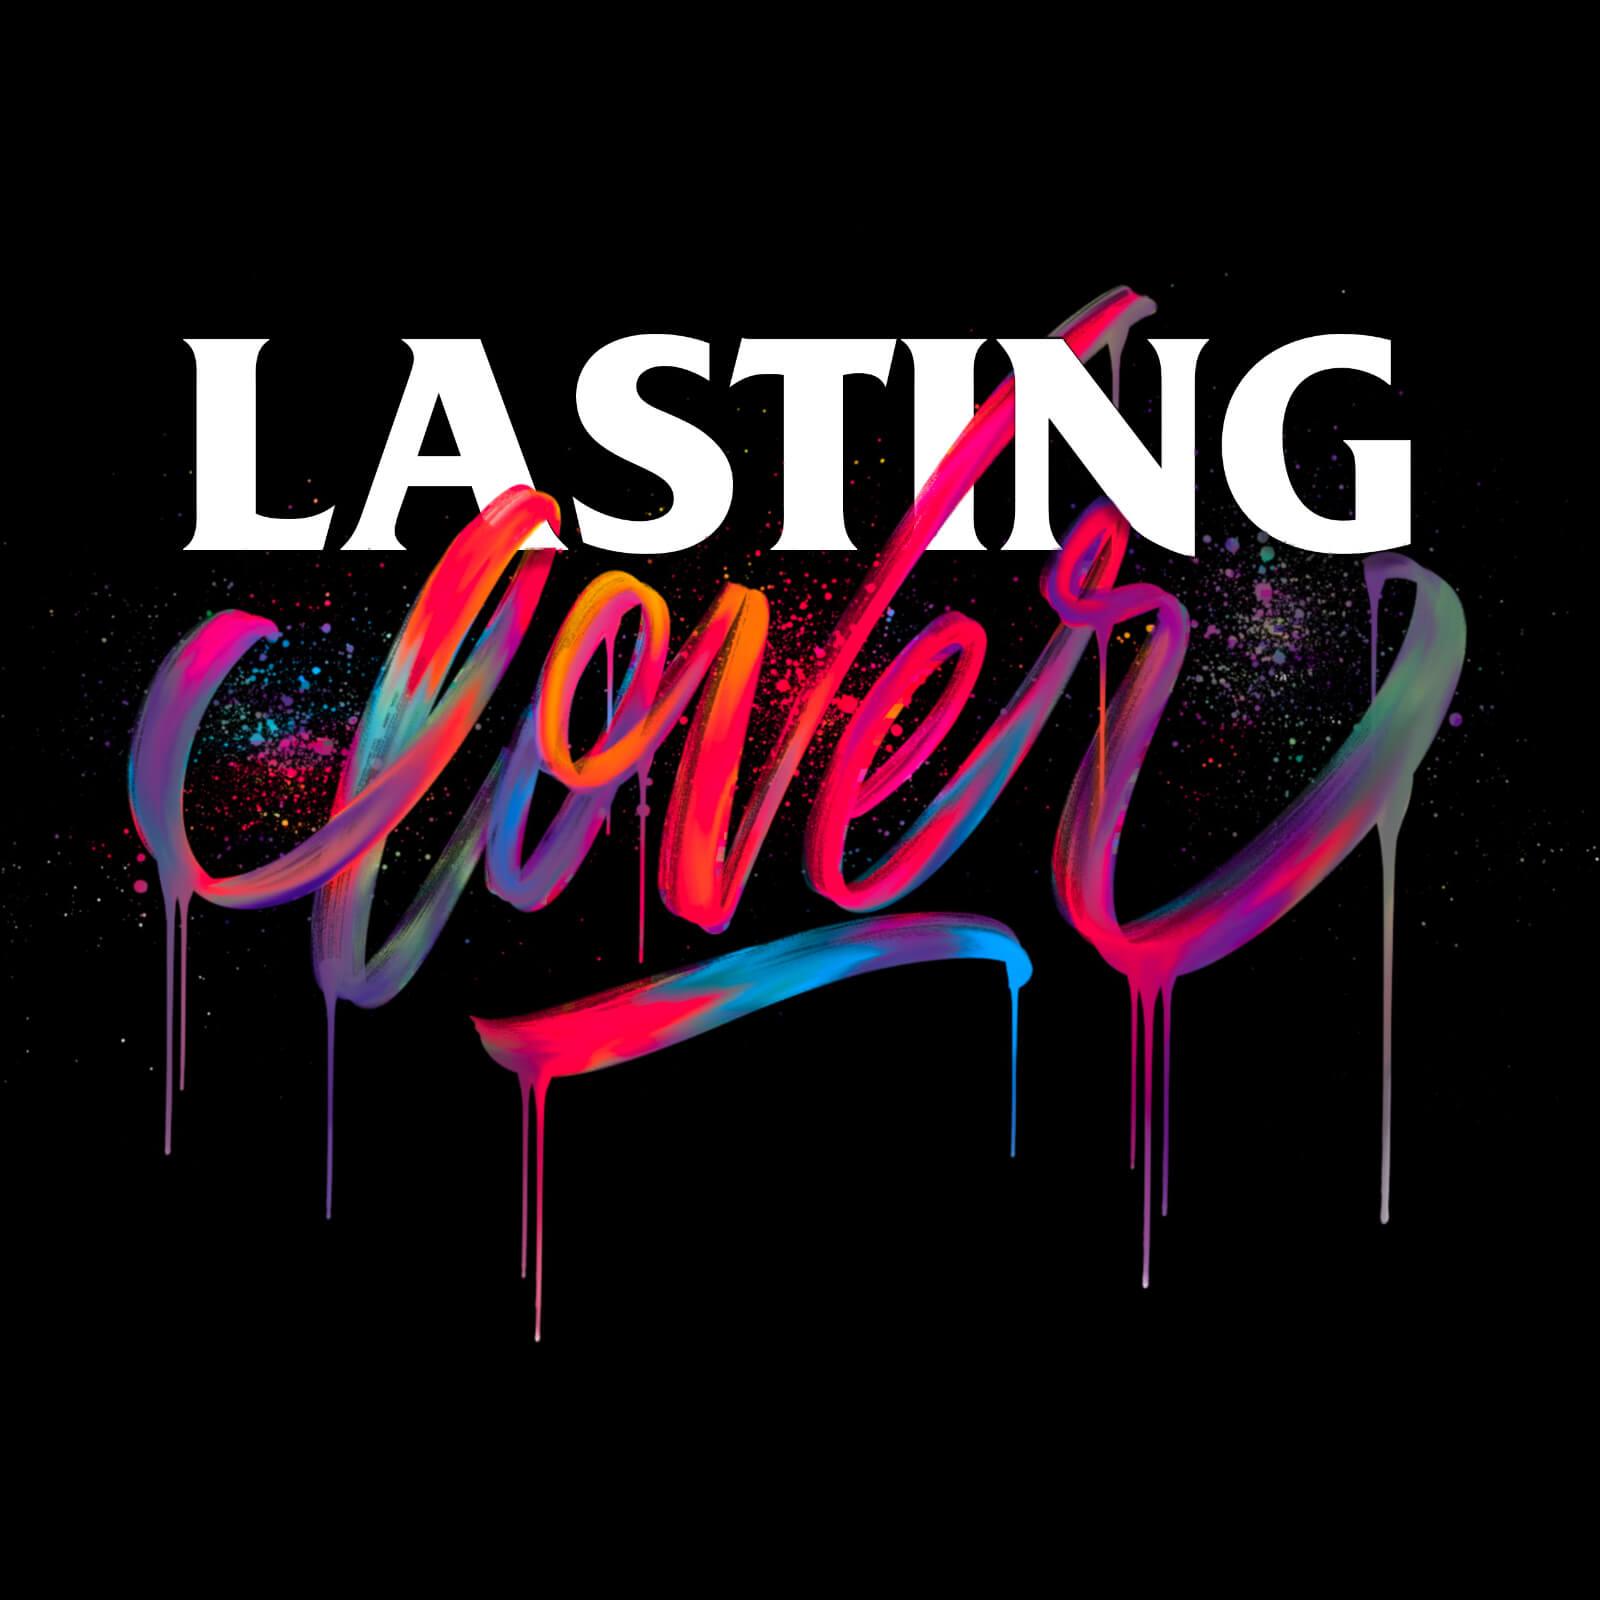 Lasting Lover - Mister G Designs